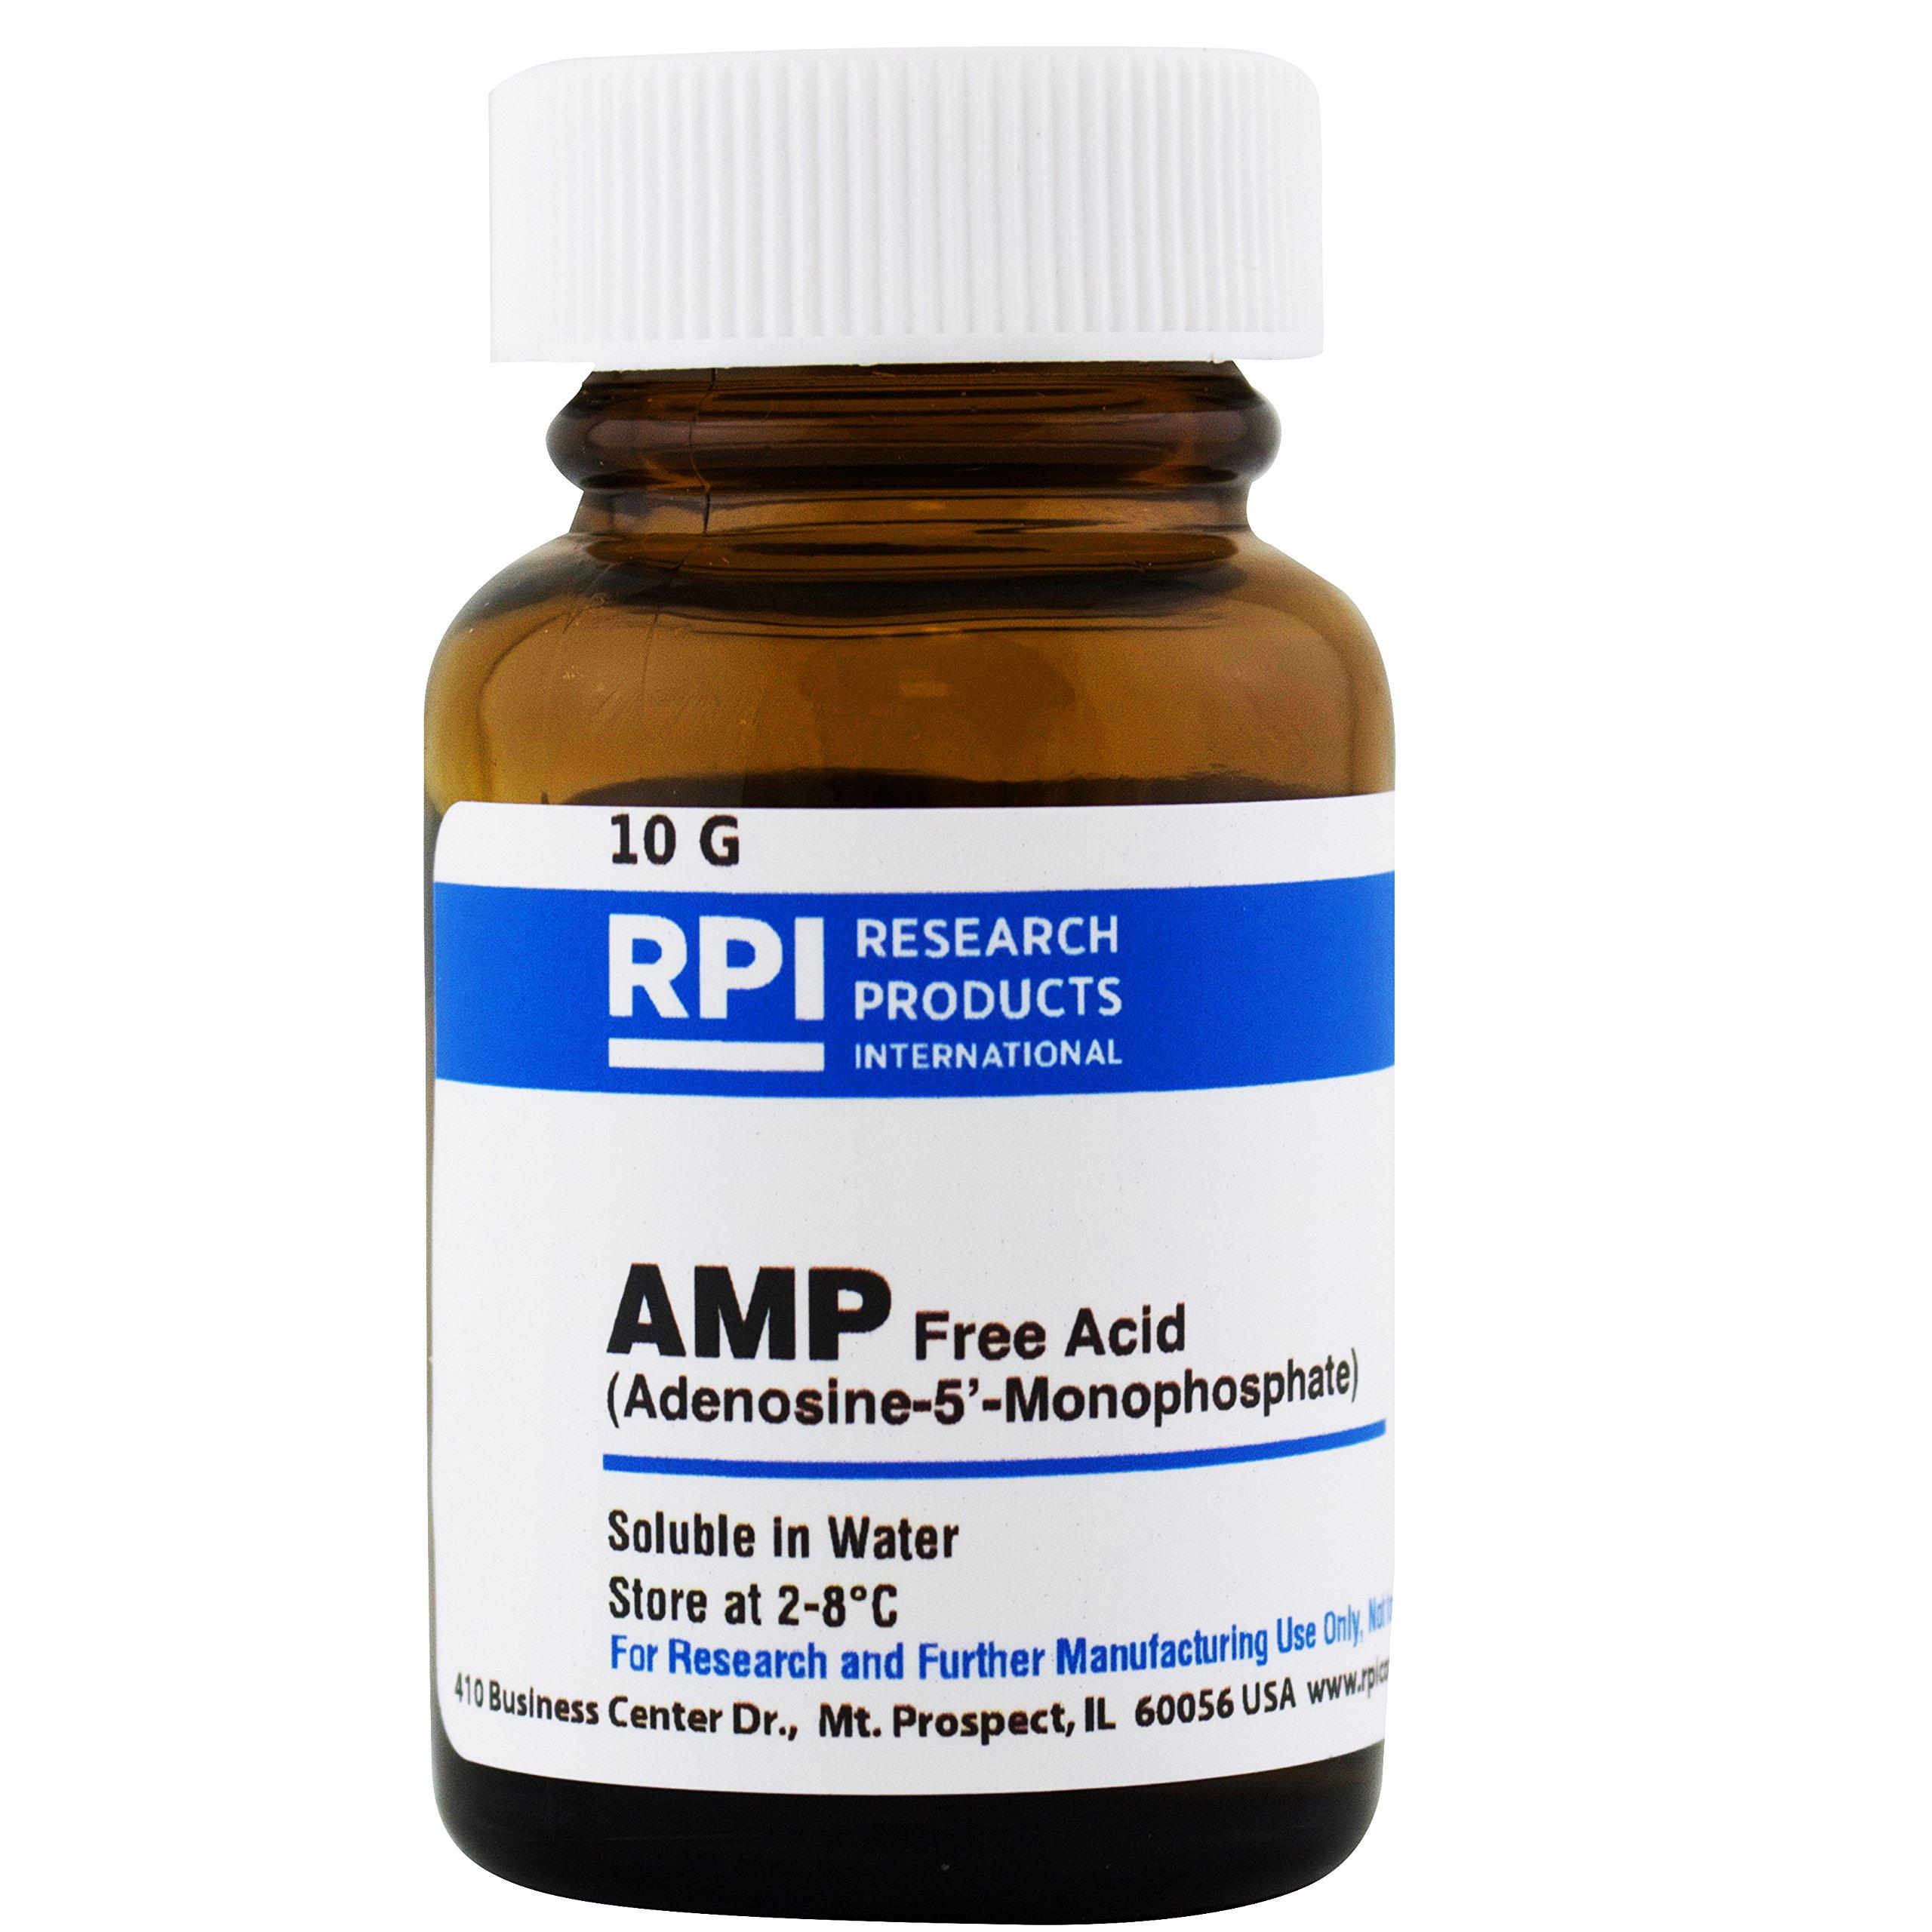 AMP [Adenosine-5-Monophosphate, Free Acid], 10 Grams